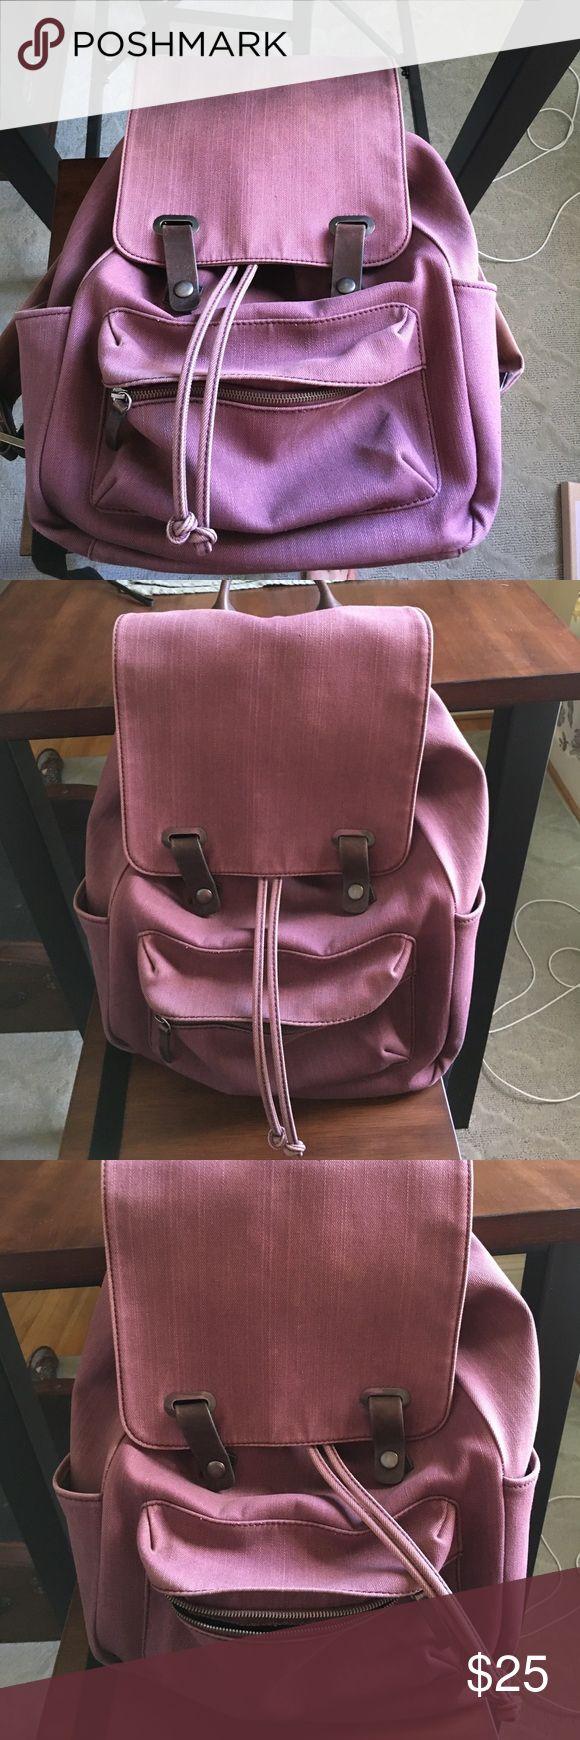 Everlane backpack – pink purple Everlane backpack …